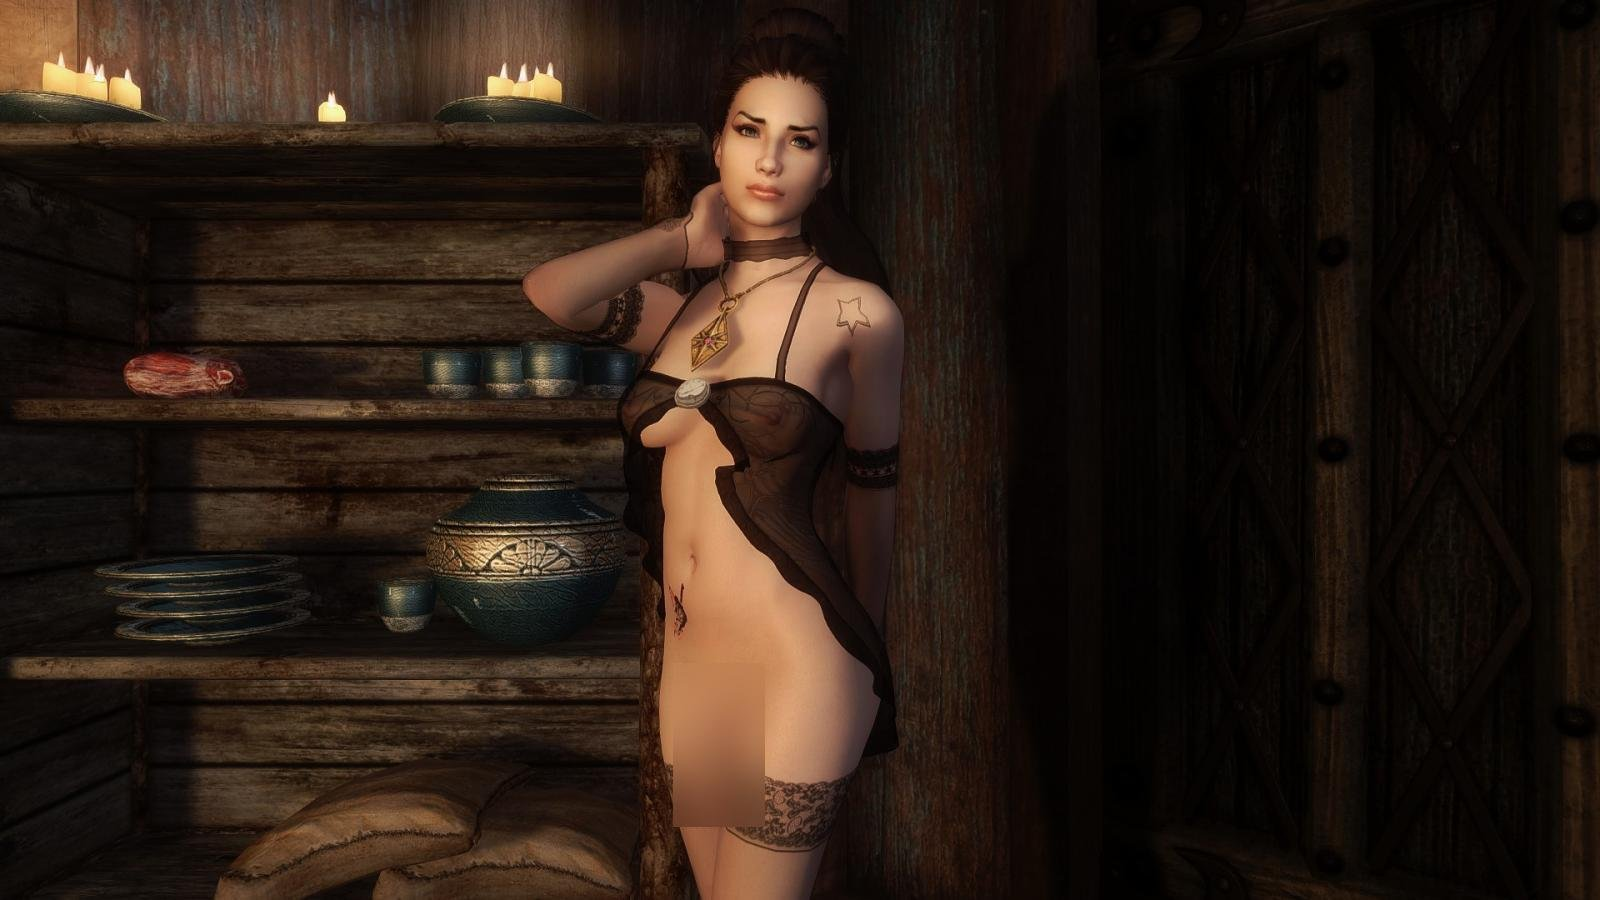 Kalena Rios Transsexual Follower LE и SE Rus